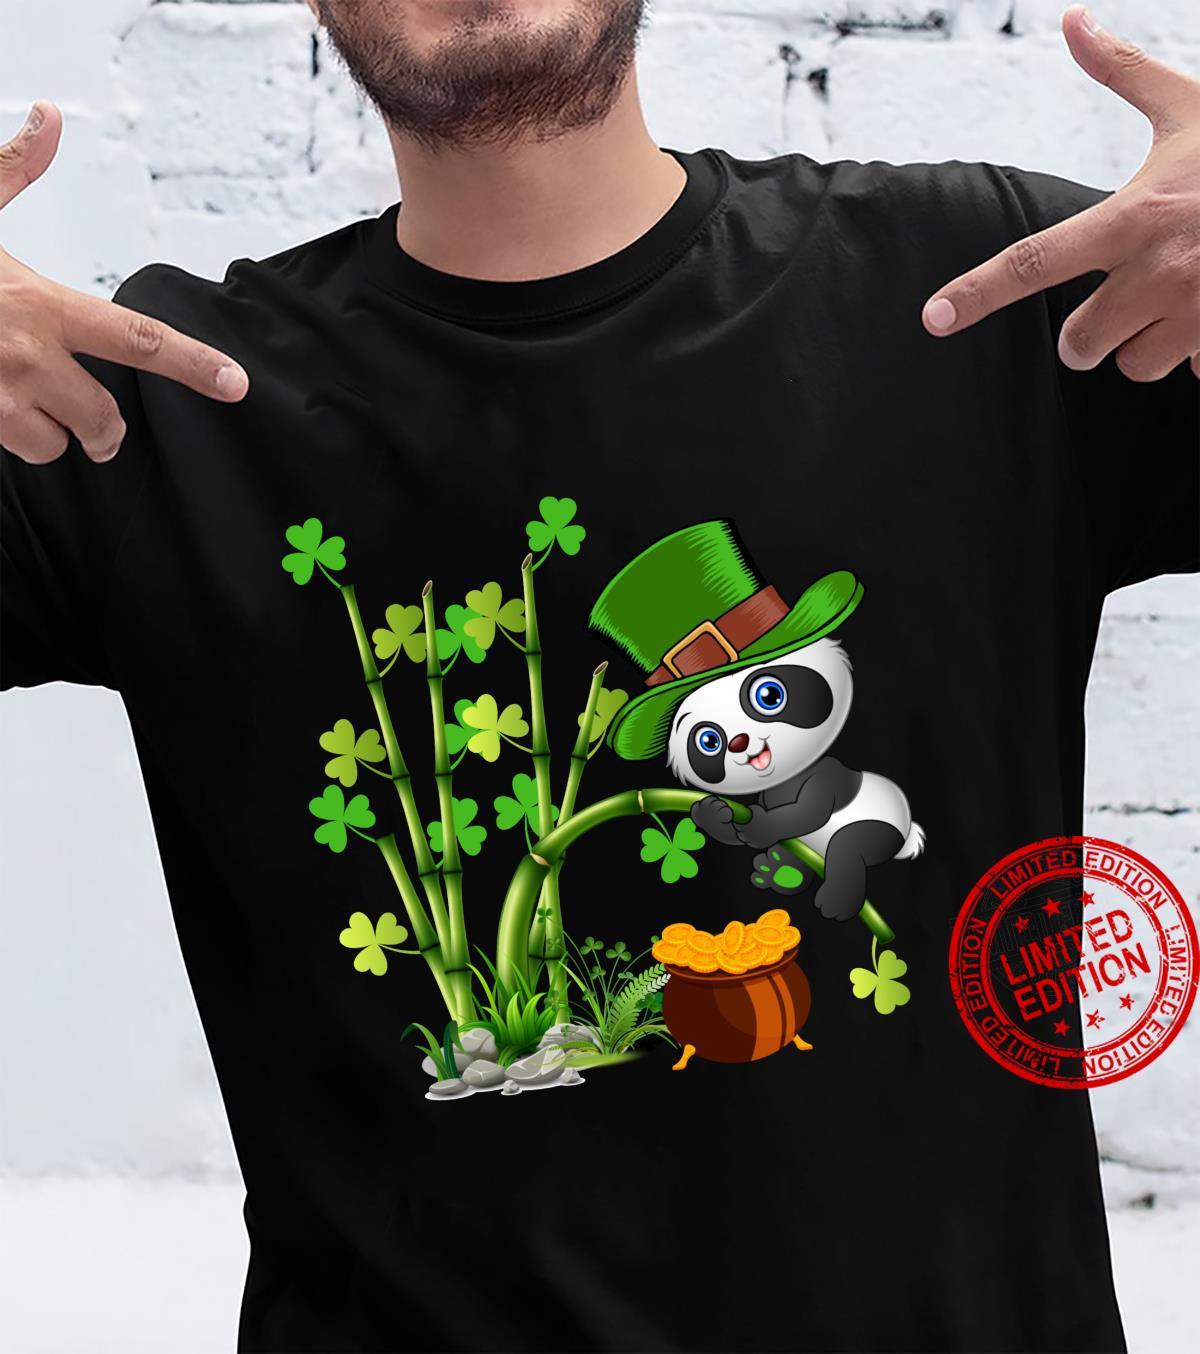 Cute Panda Irish Leprechaun St. Patrick's Day Shirt